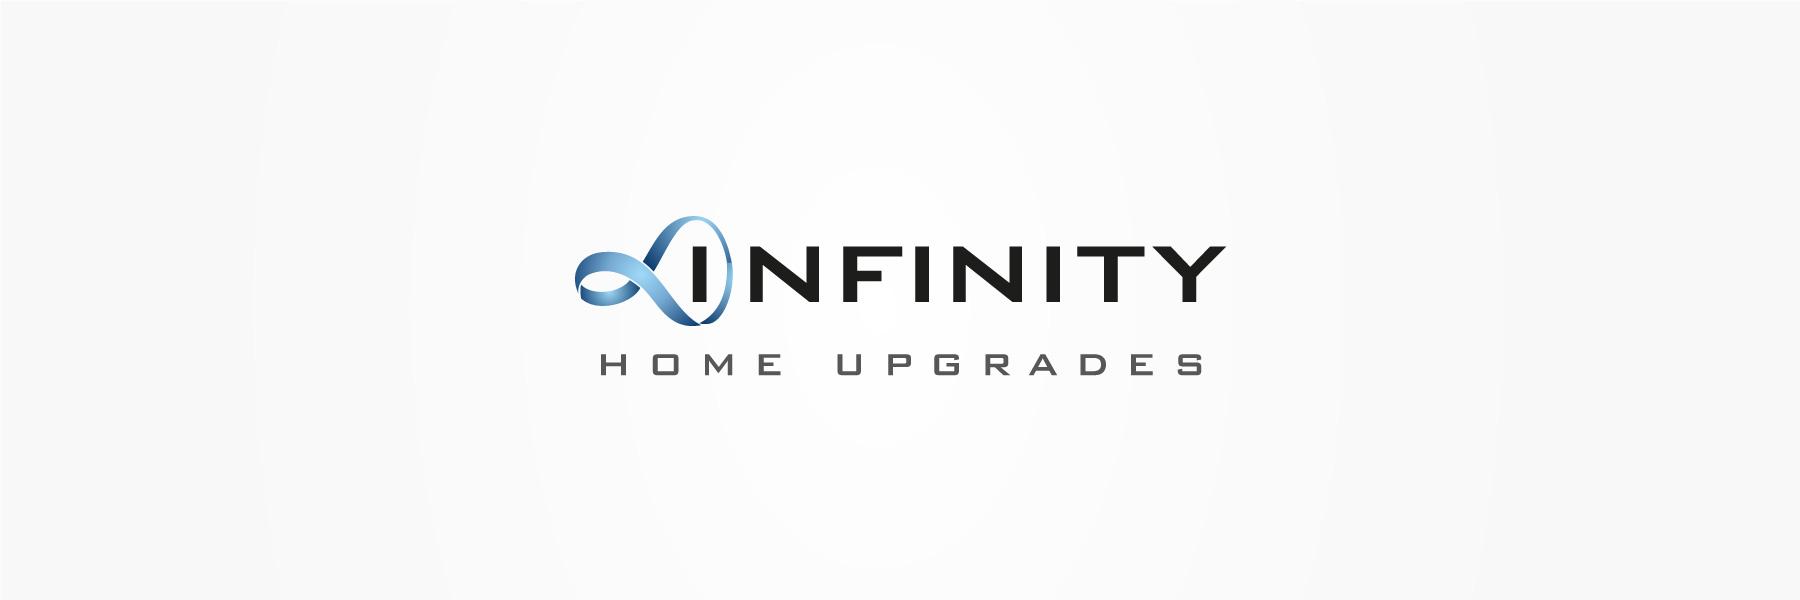 Infinity-construction-logo-design